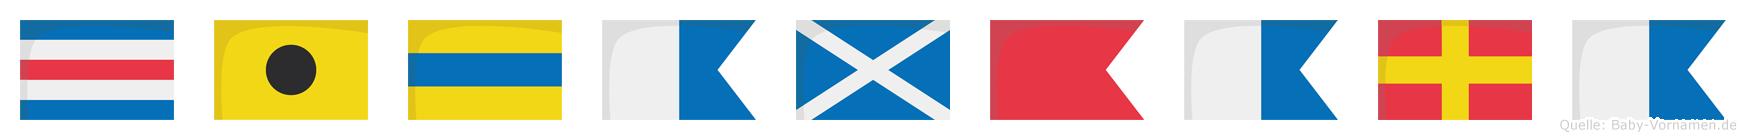 Cidambara im Flaggenalphabet